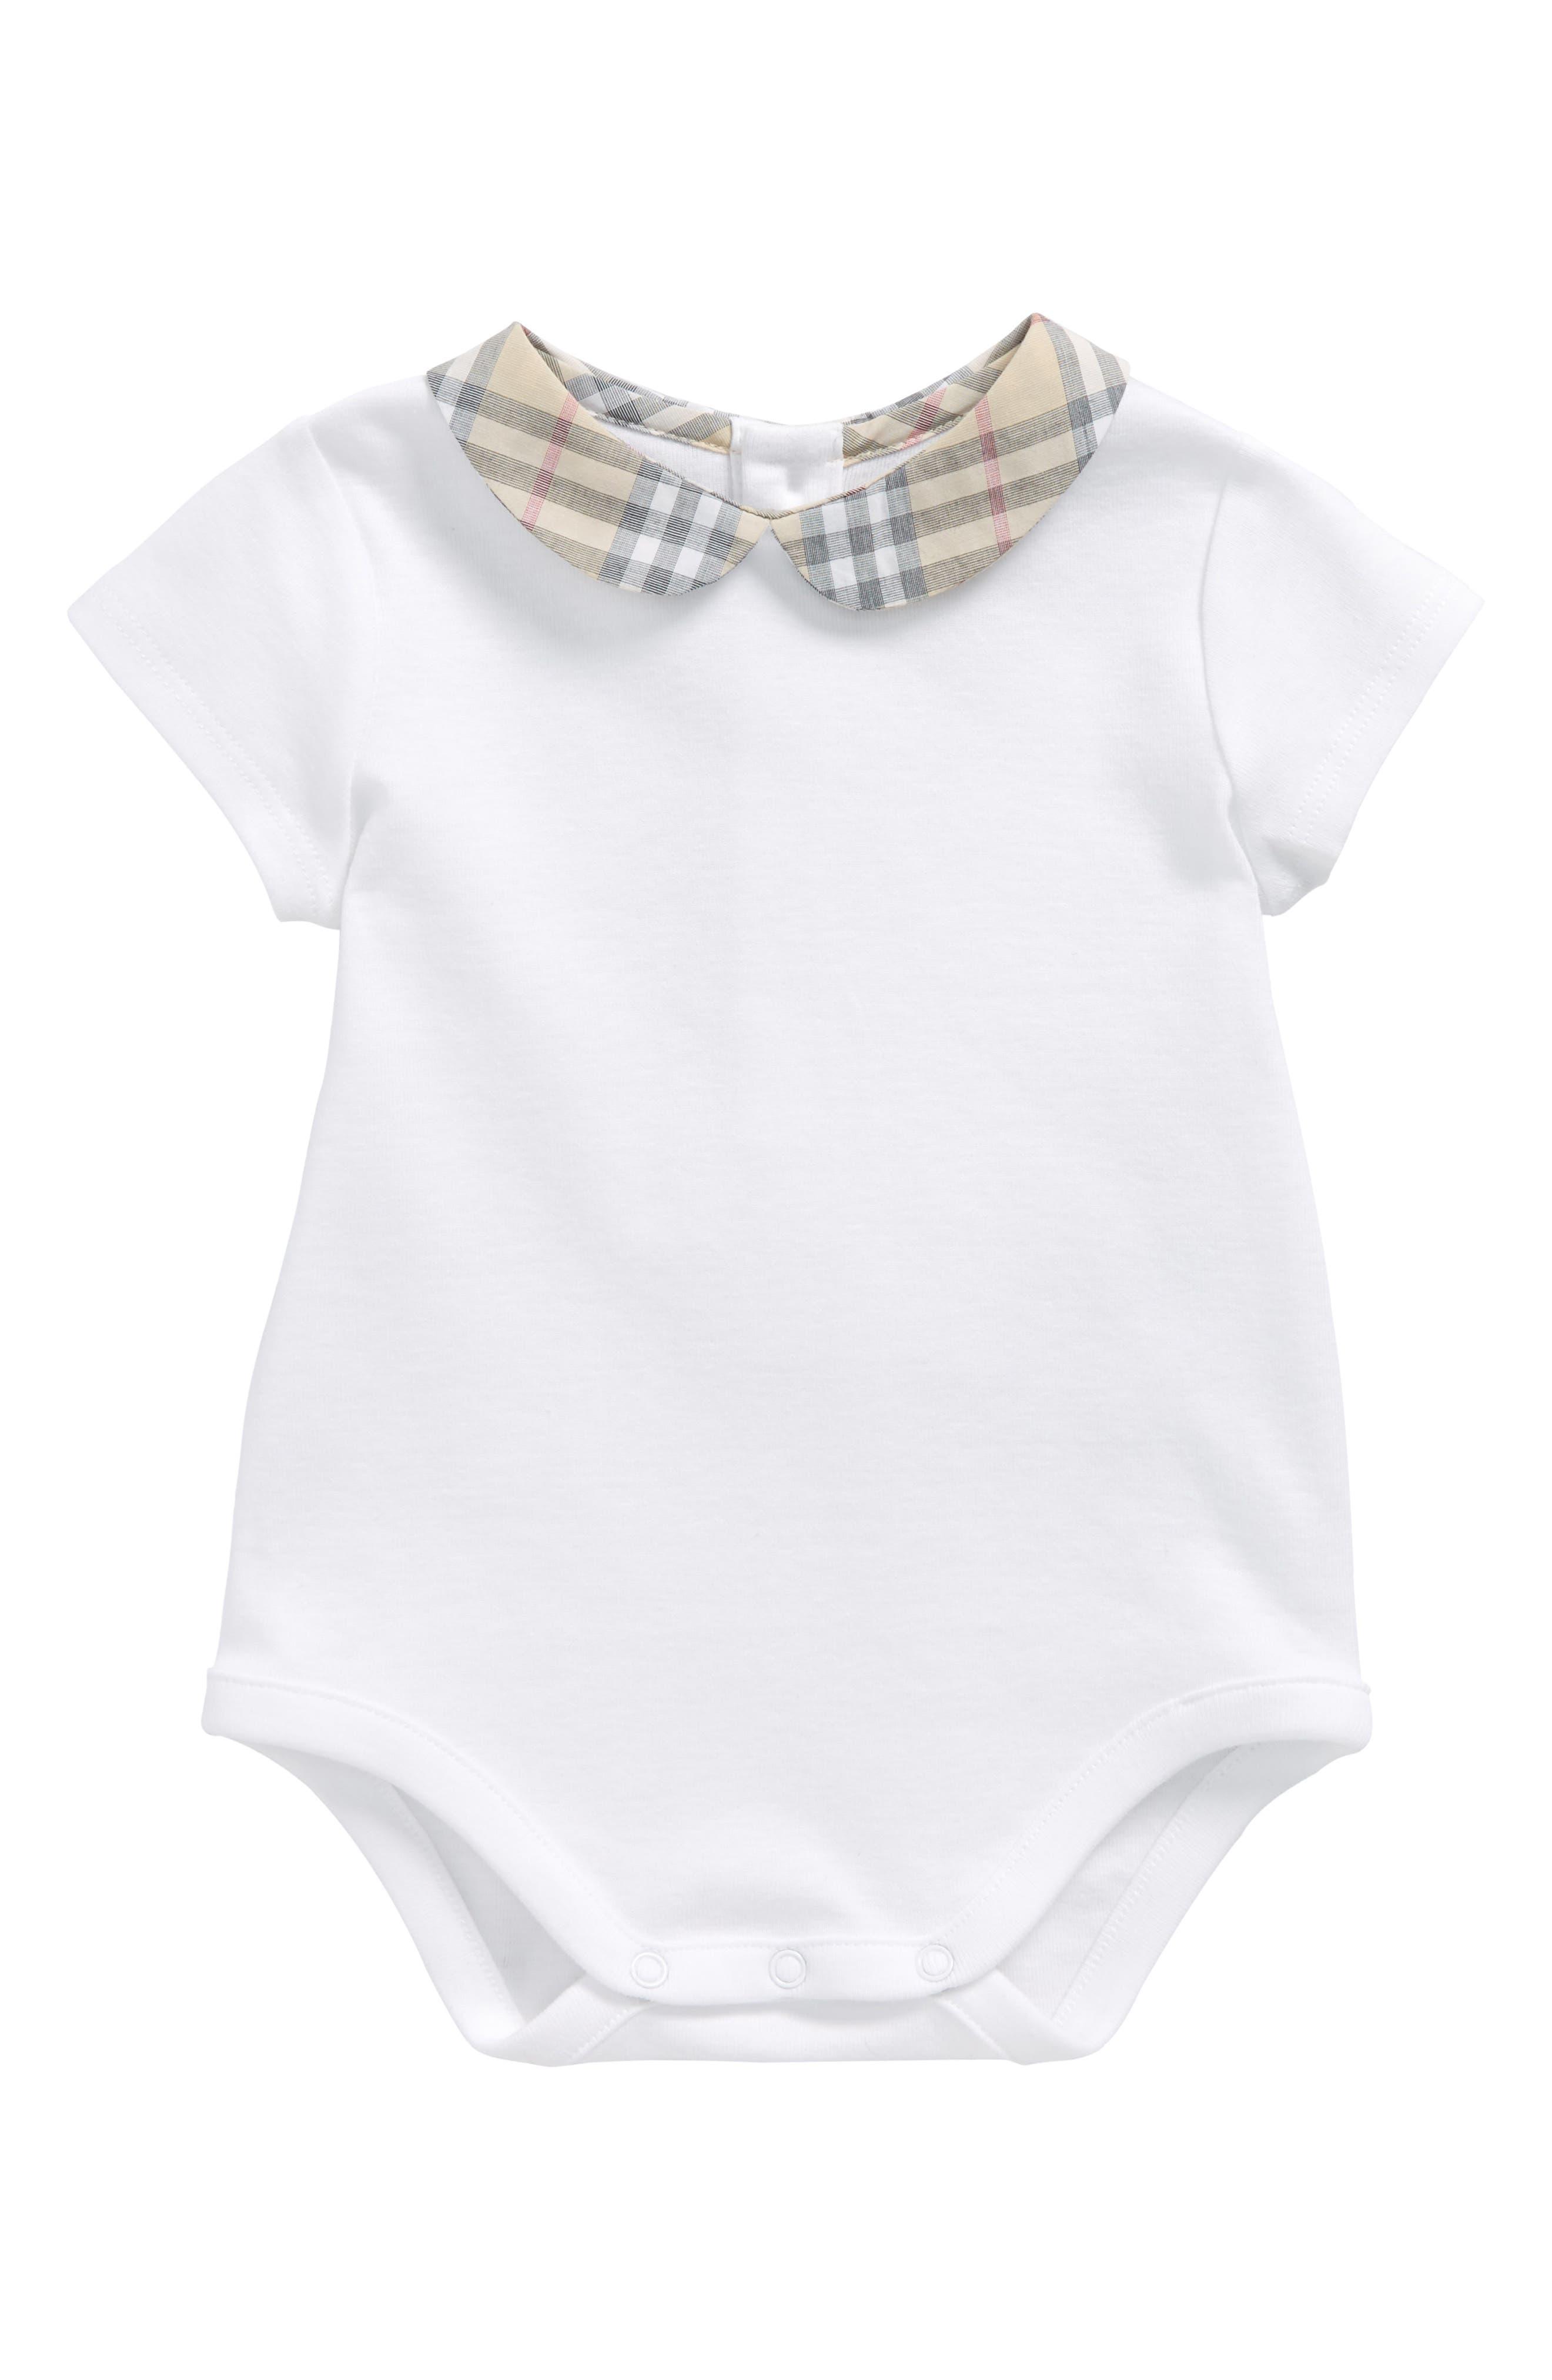 burberry baby t shirt